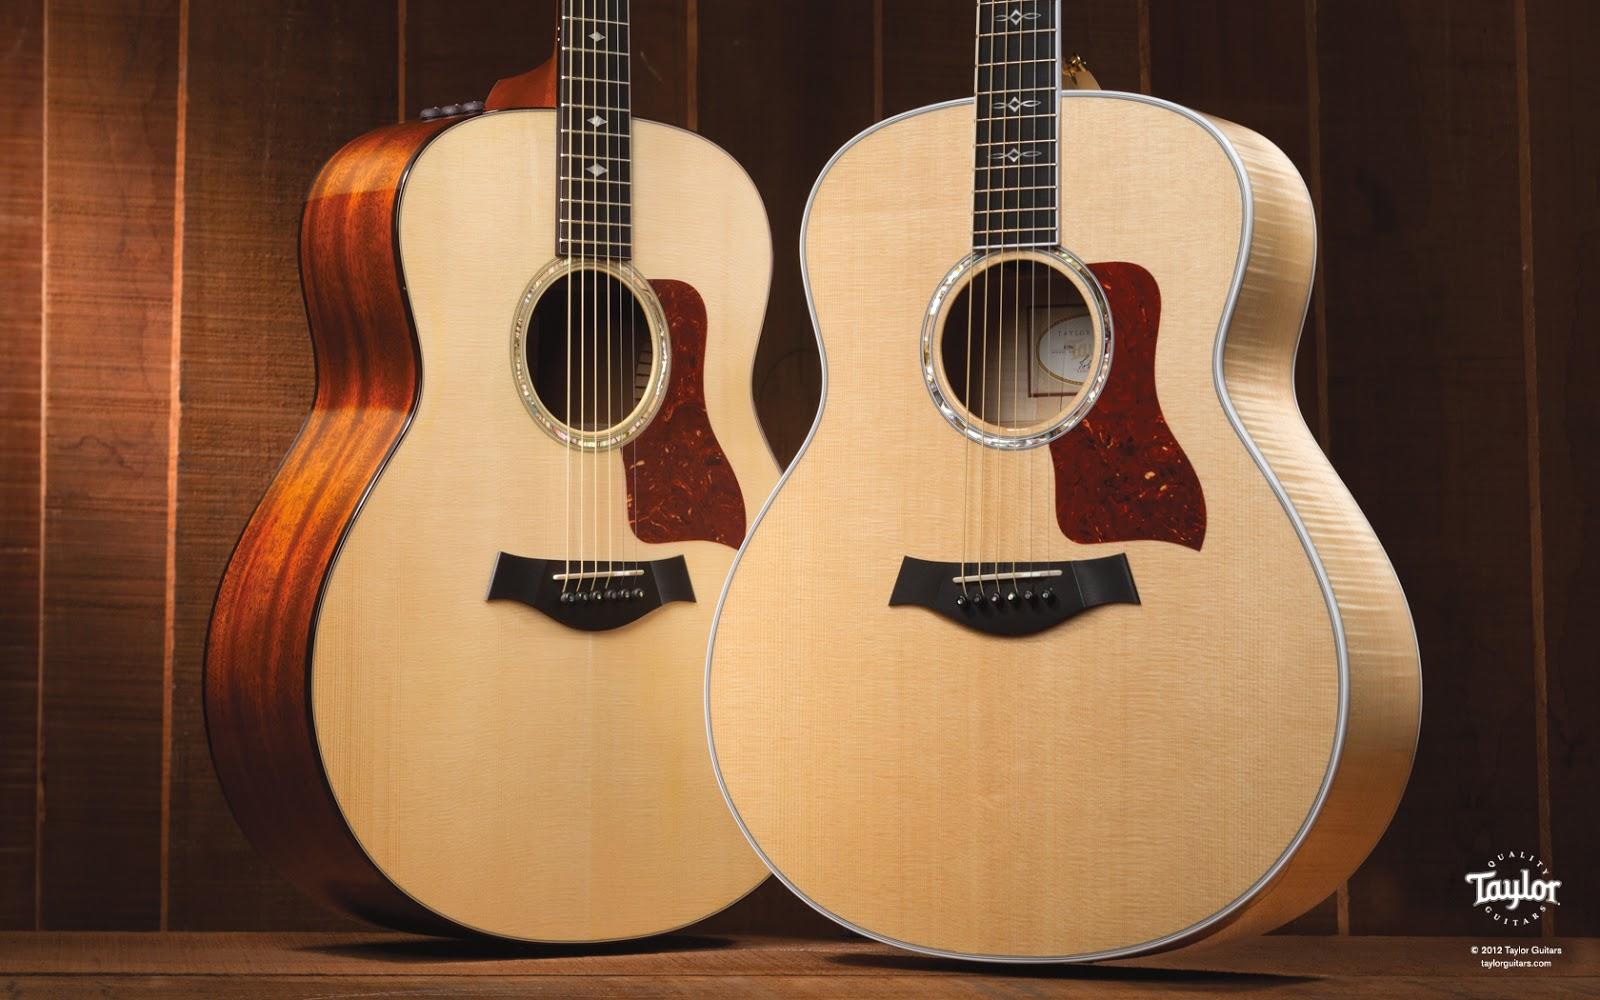 taylor guitars wallpapers - photo #3